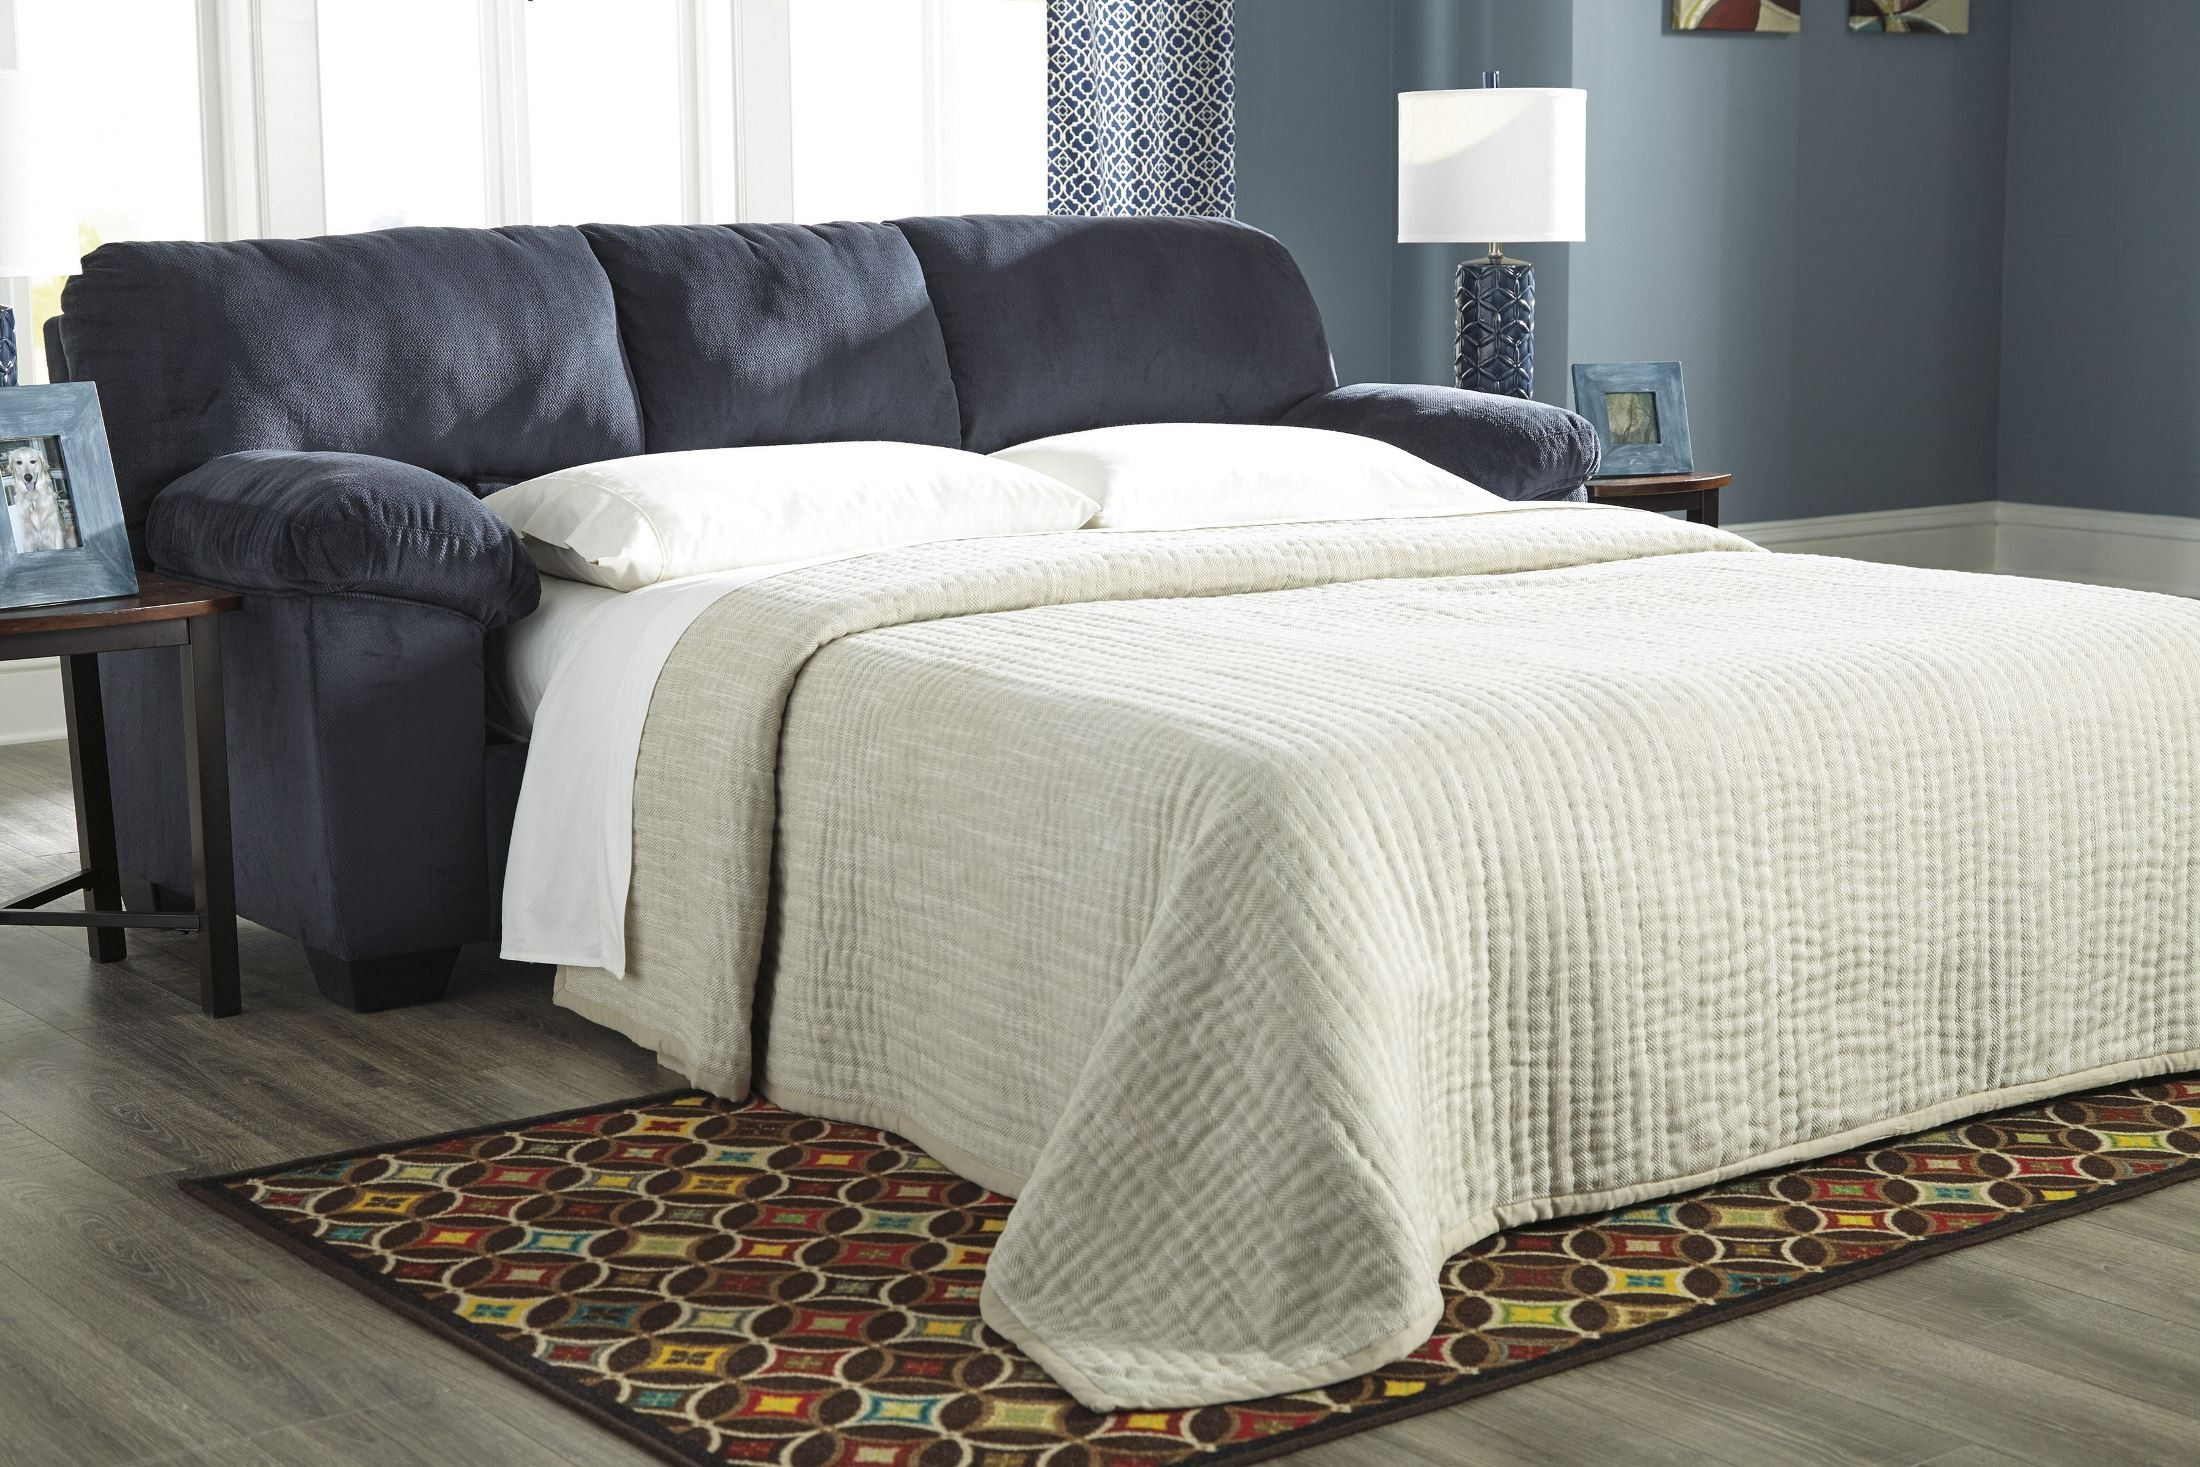 Dailey Midnight Full Sofa Sleeper From Ashley 9540236